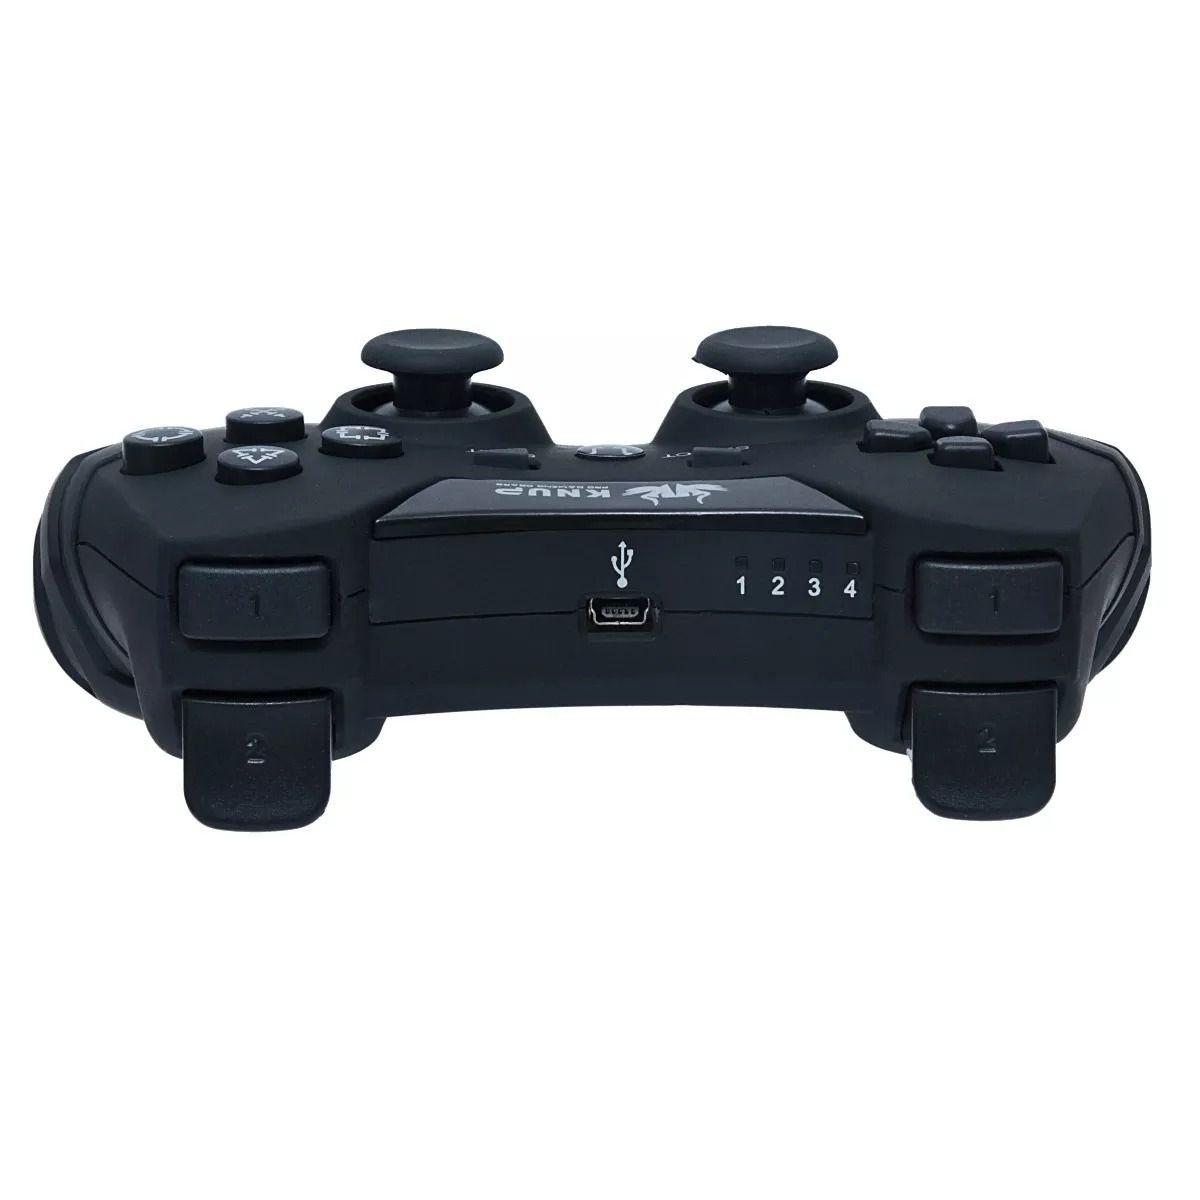 Controle Sem Fio 5 Em 1 Wireless Pc/ps1/ps2/ps3